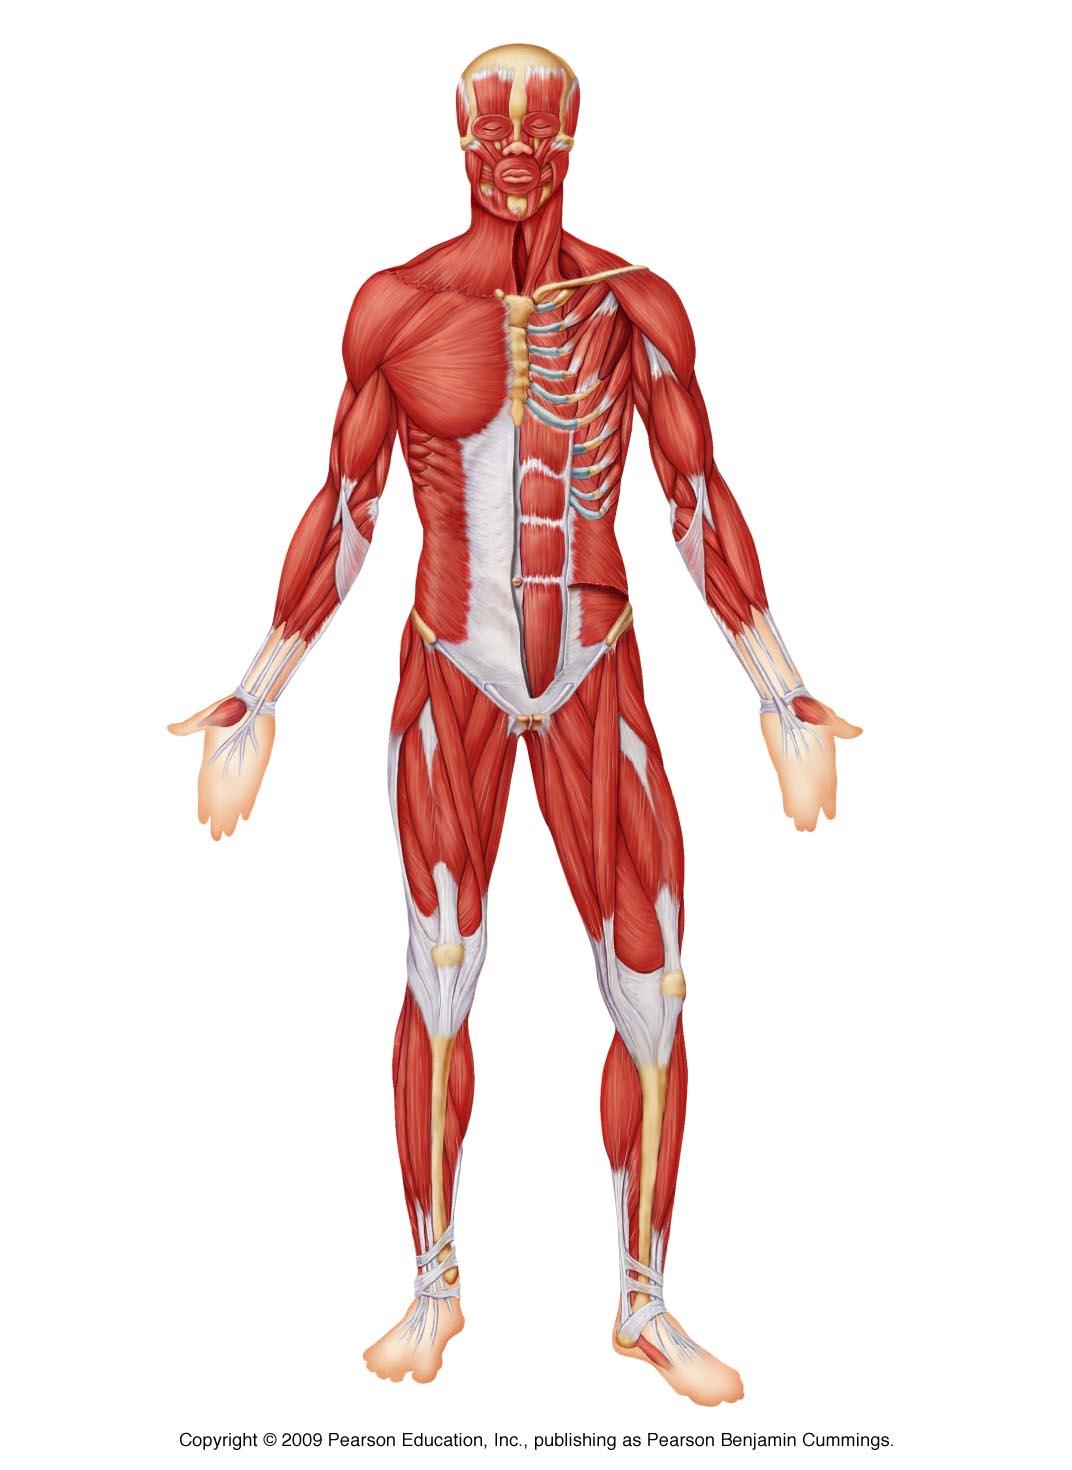 Charmant Label Muscular System Fotos - Anatomie Ideen - finotti.info